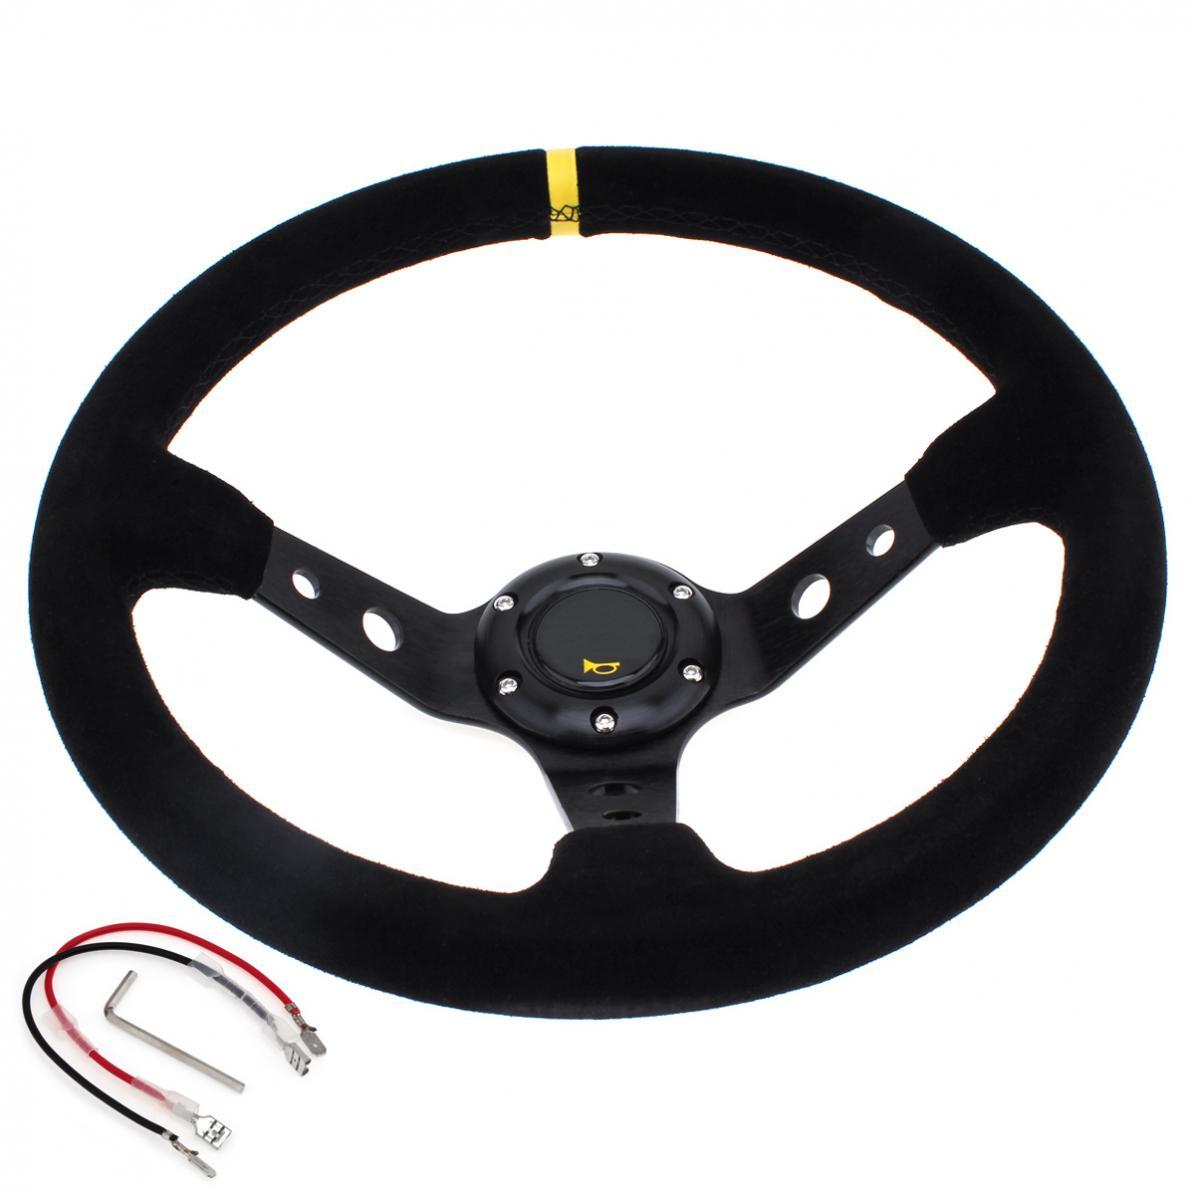 2017 Universal 14 Inch Racing Car Steering Wheel Universal ...